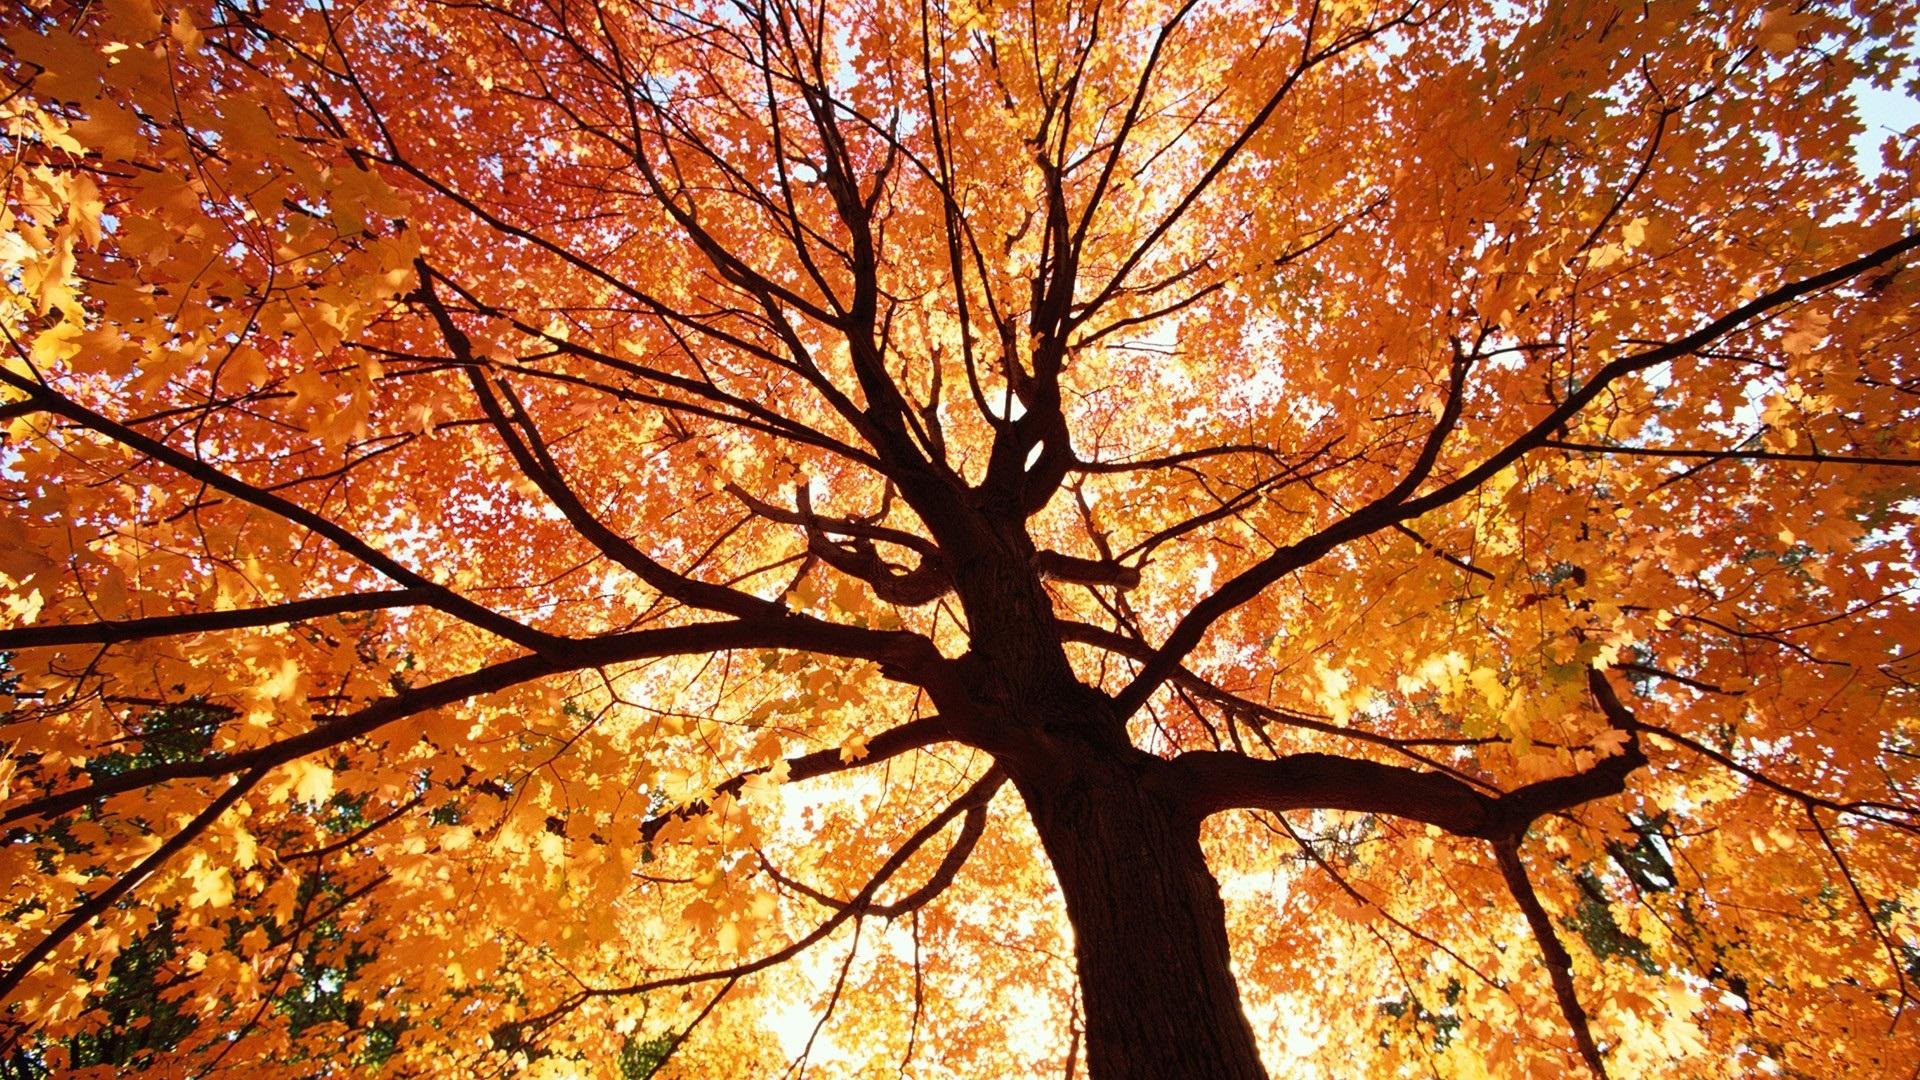 Fall Leaves Wallpaper Windows 7 Autumn Scenery Random Photo 35926740 Fanpop